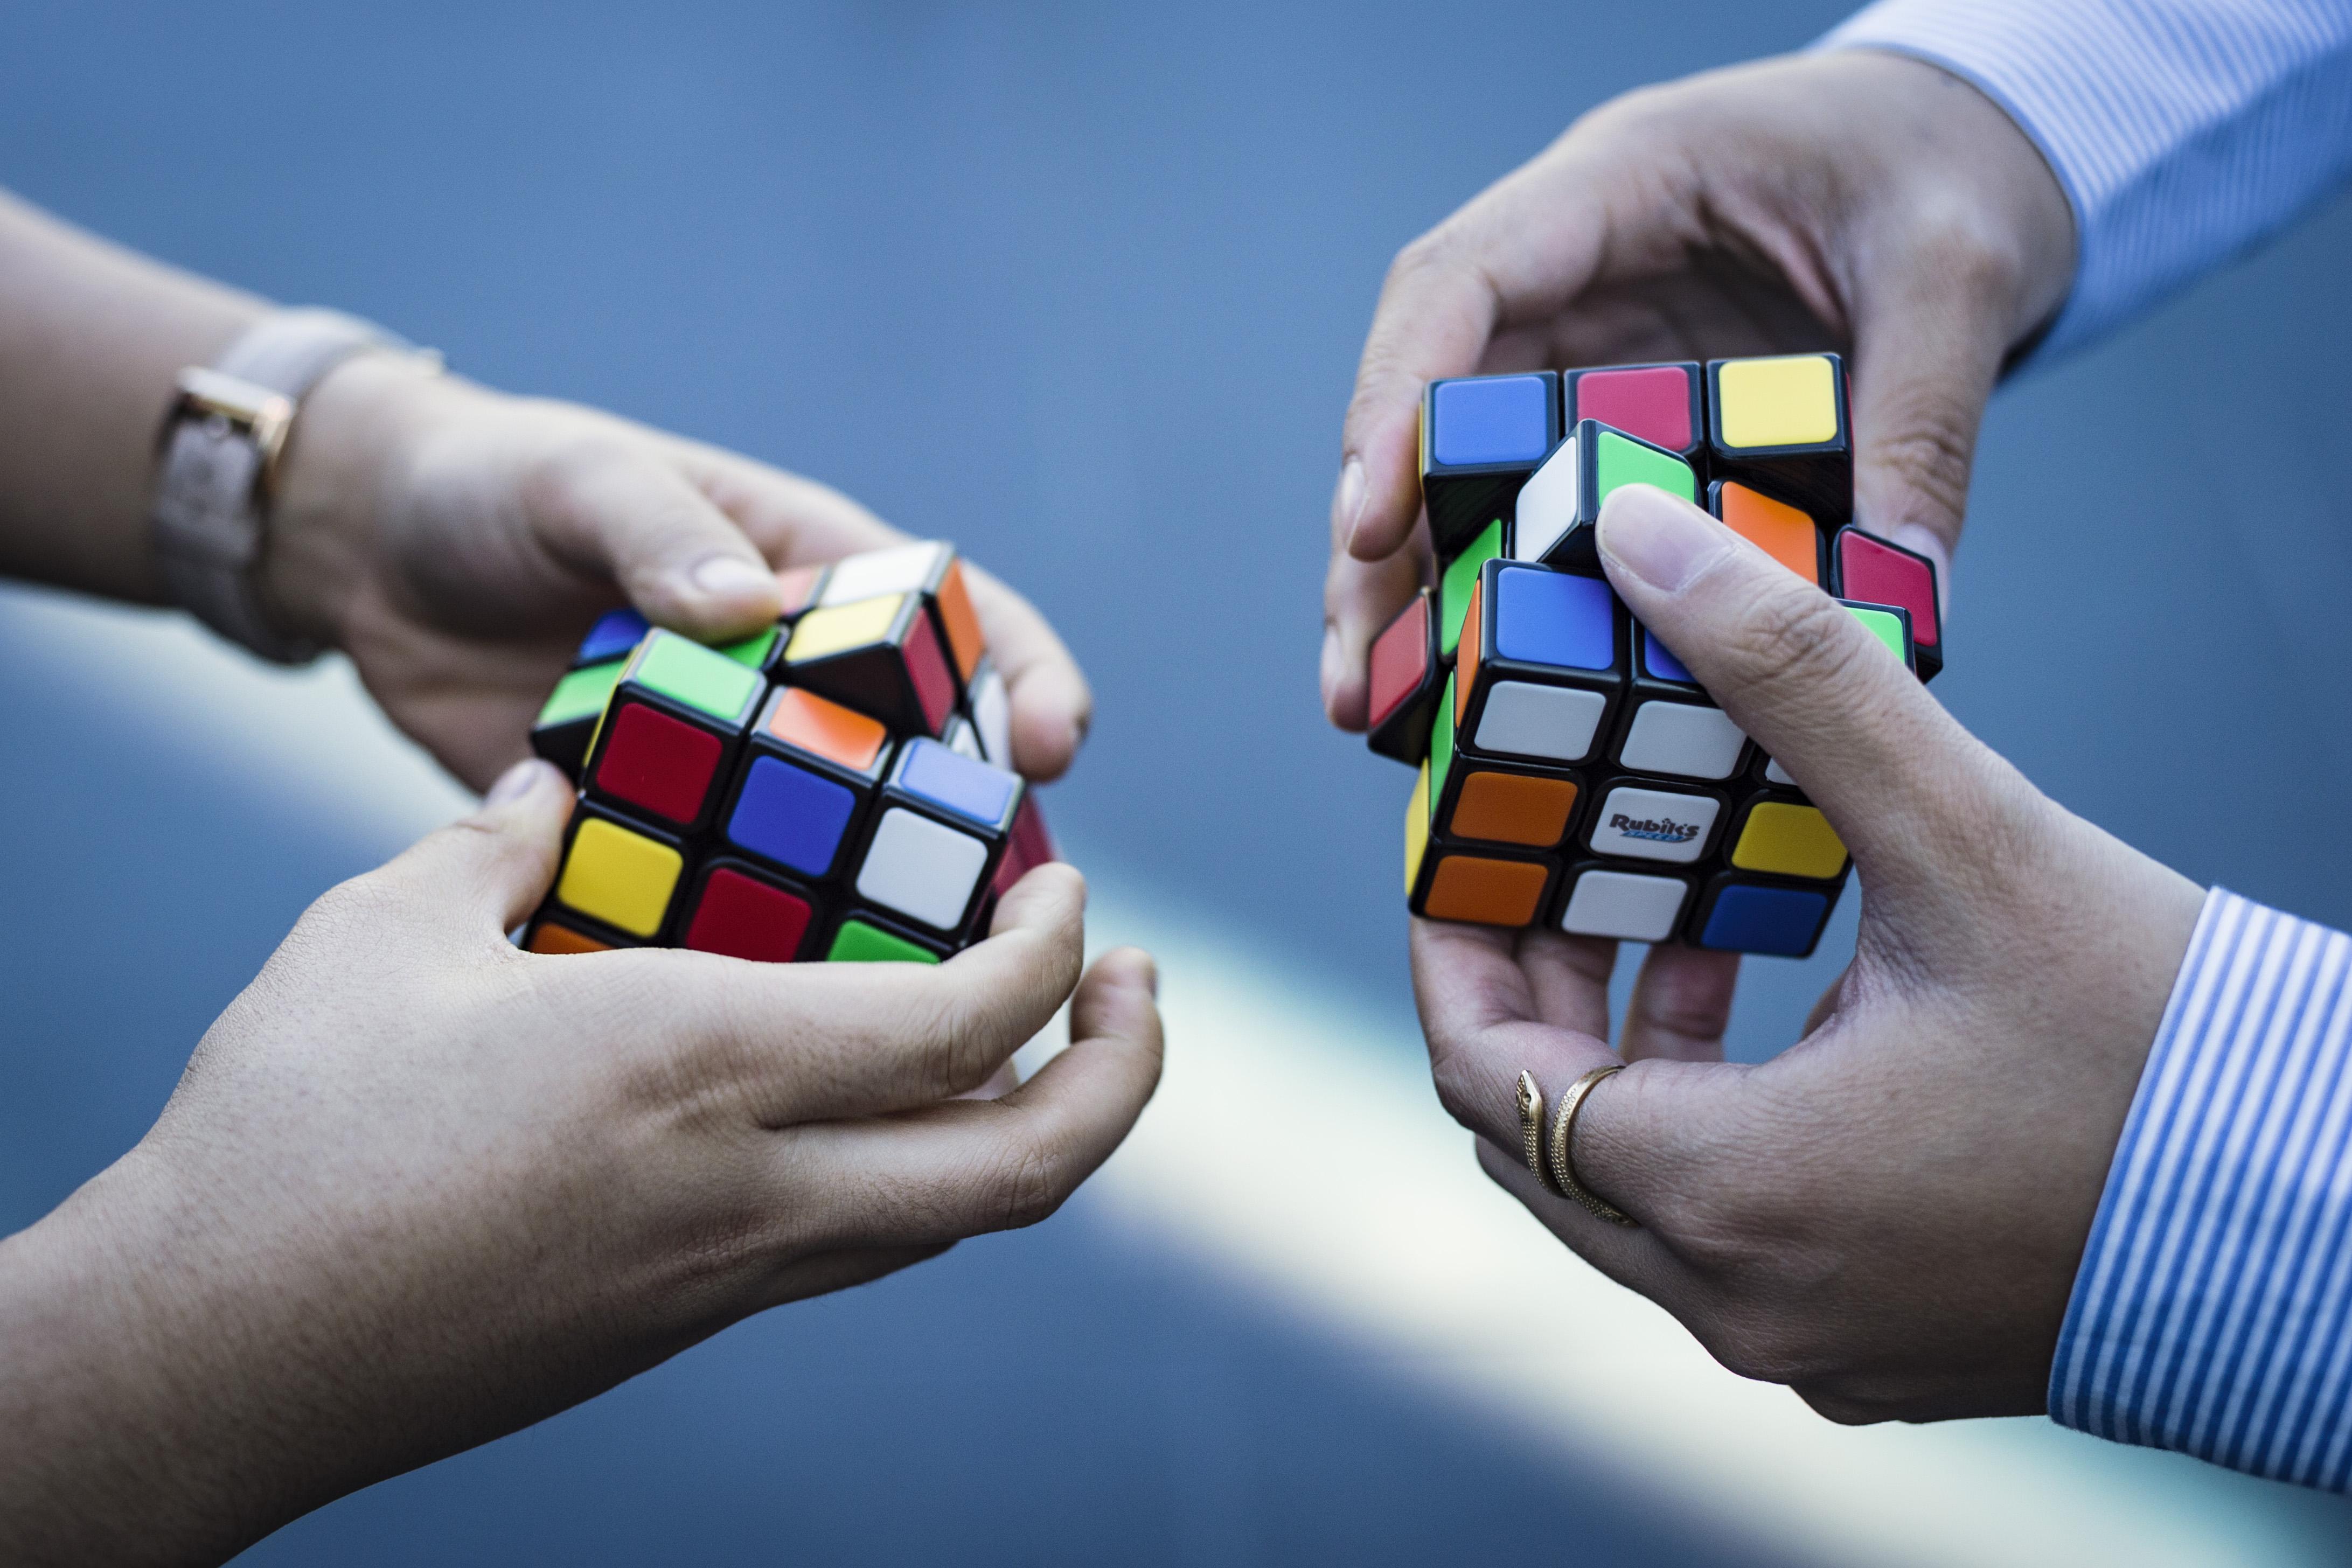 171014-RB-Cube-dsc_9426